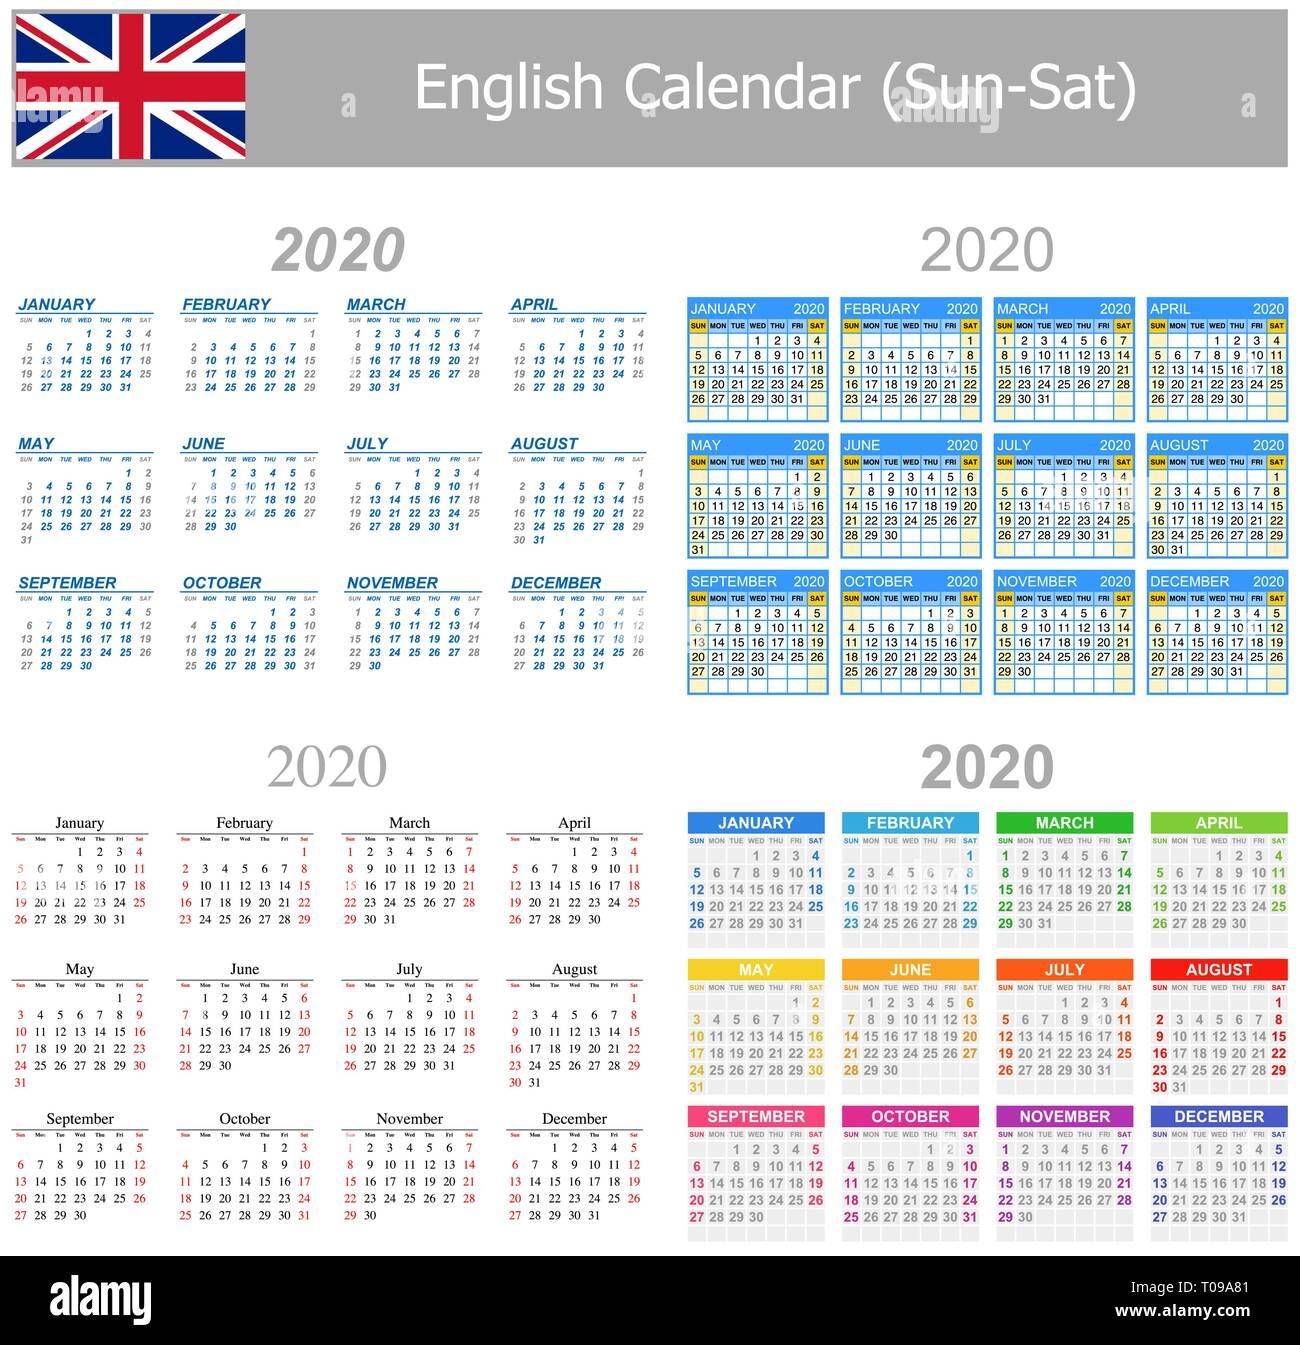 Calendario Islamico 2020.Calendar English Imagenes De Stock Calendar English Fotos De Stock